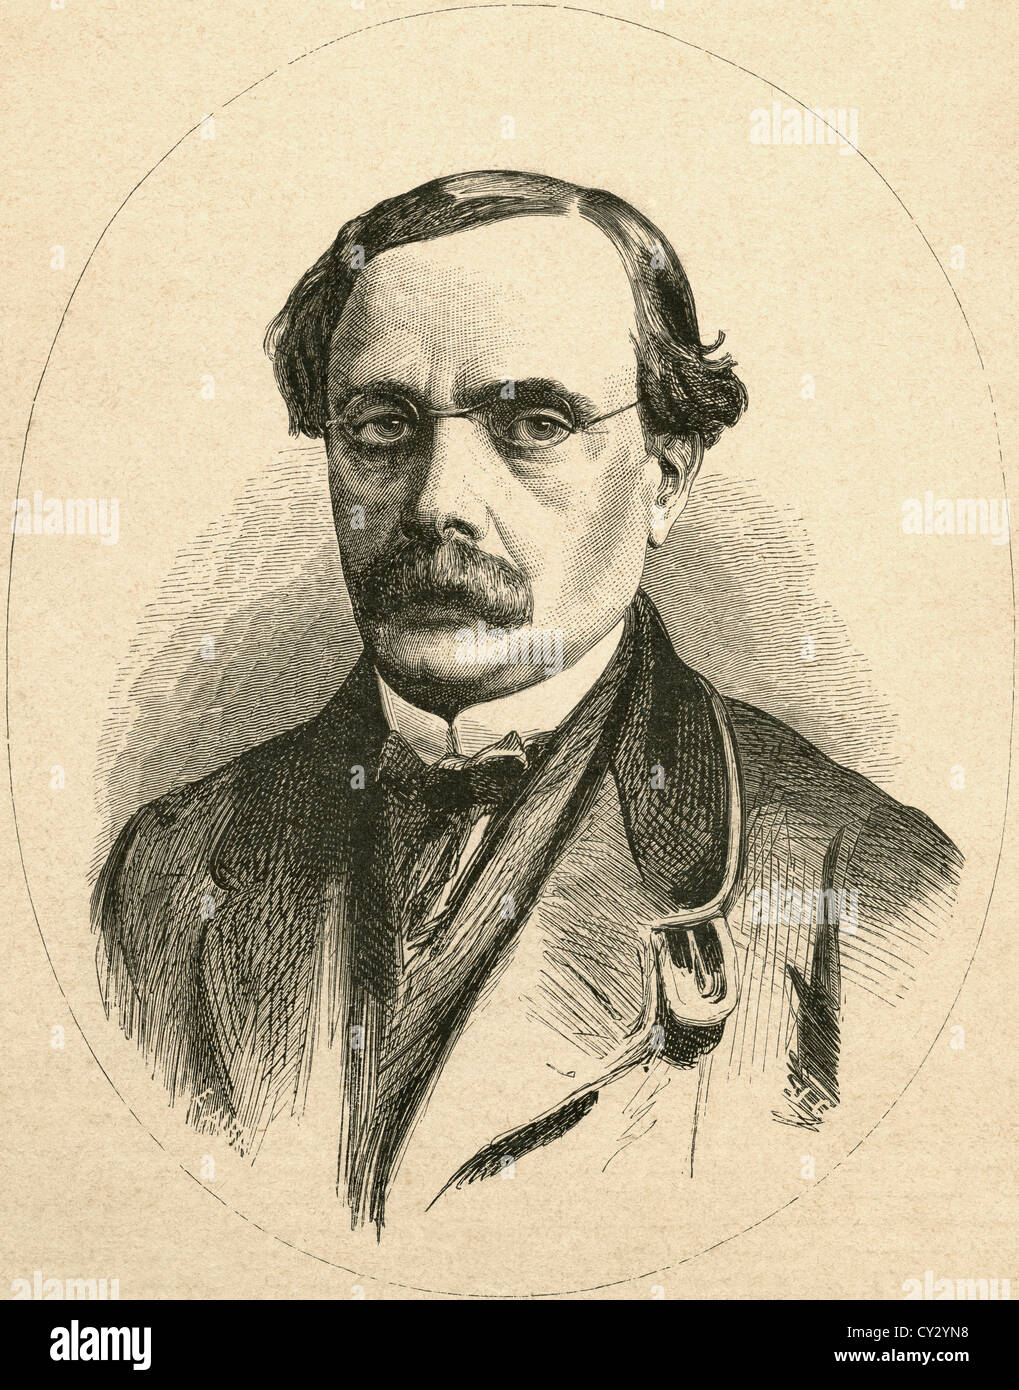 Antonio García Gutiérrez, 1813- 1884. Spanish Romantic dramatist and poet. - Stock Image